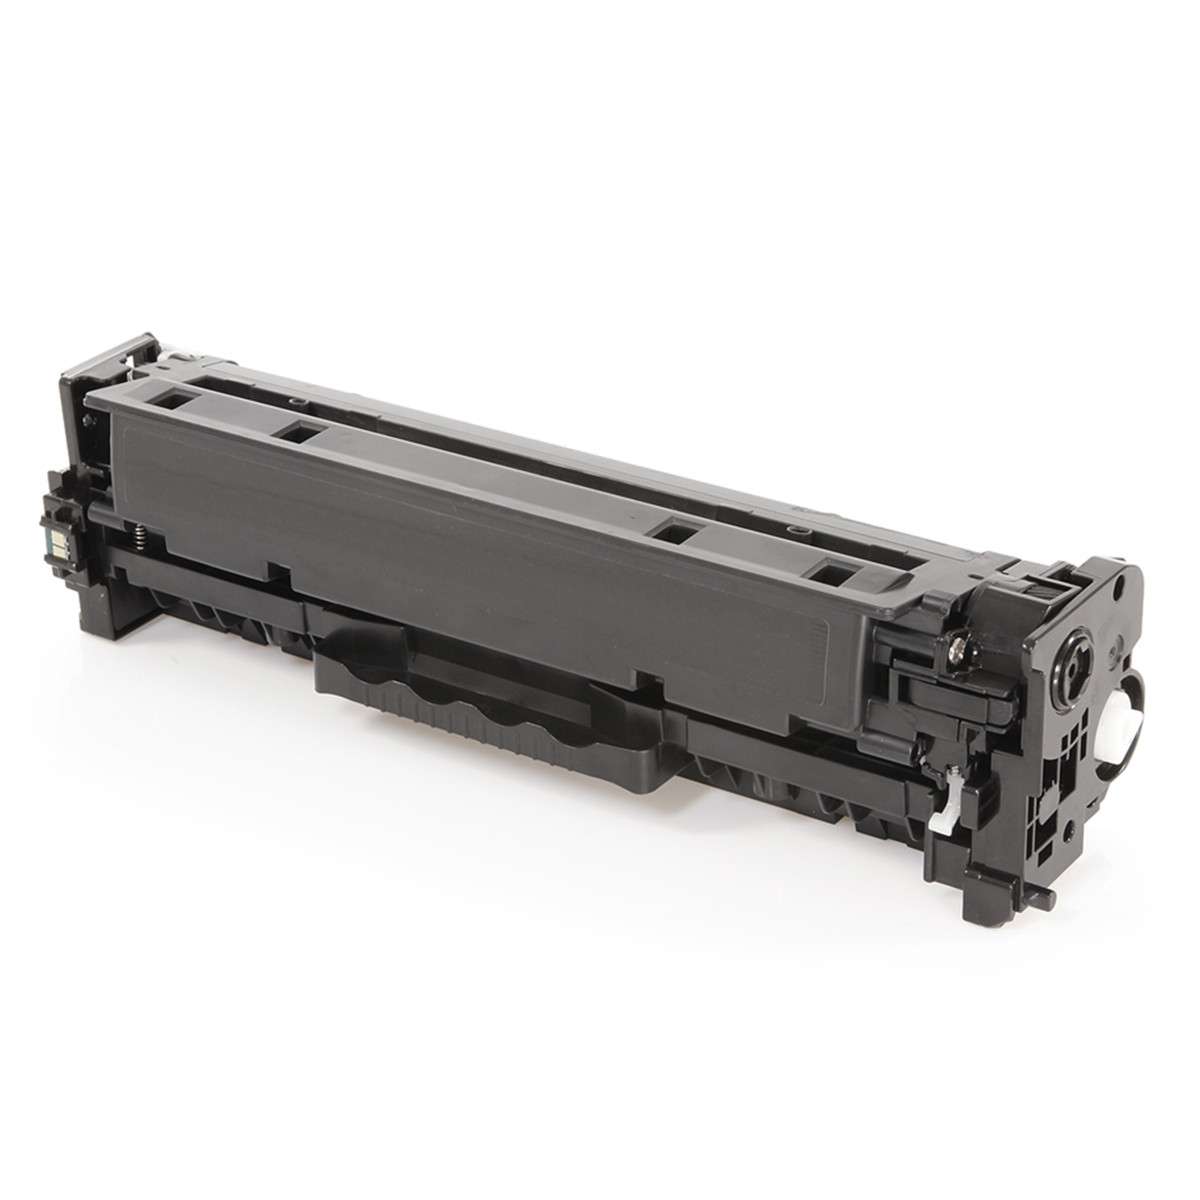 Toner Compatível HP CE413A 305A Magenta Universal | M451 M351 M475 M451DW | Premium 2.8k